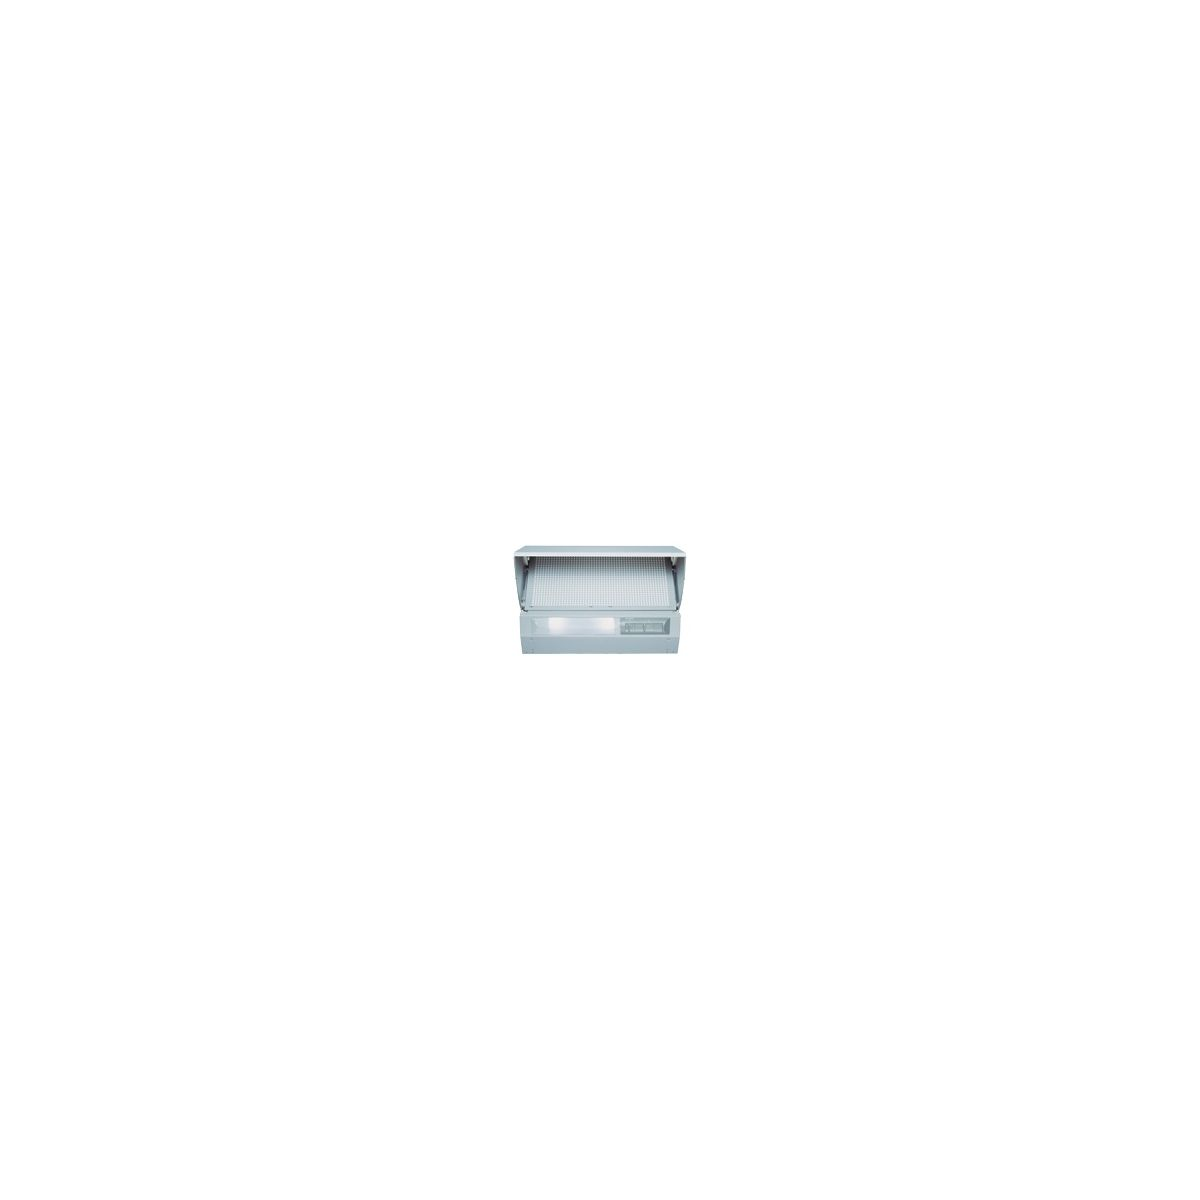 Siemens lc86ka670 hotte vendu par cdiscount 625320 - Hotte siemens lc97be532 ...